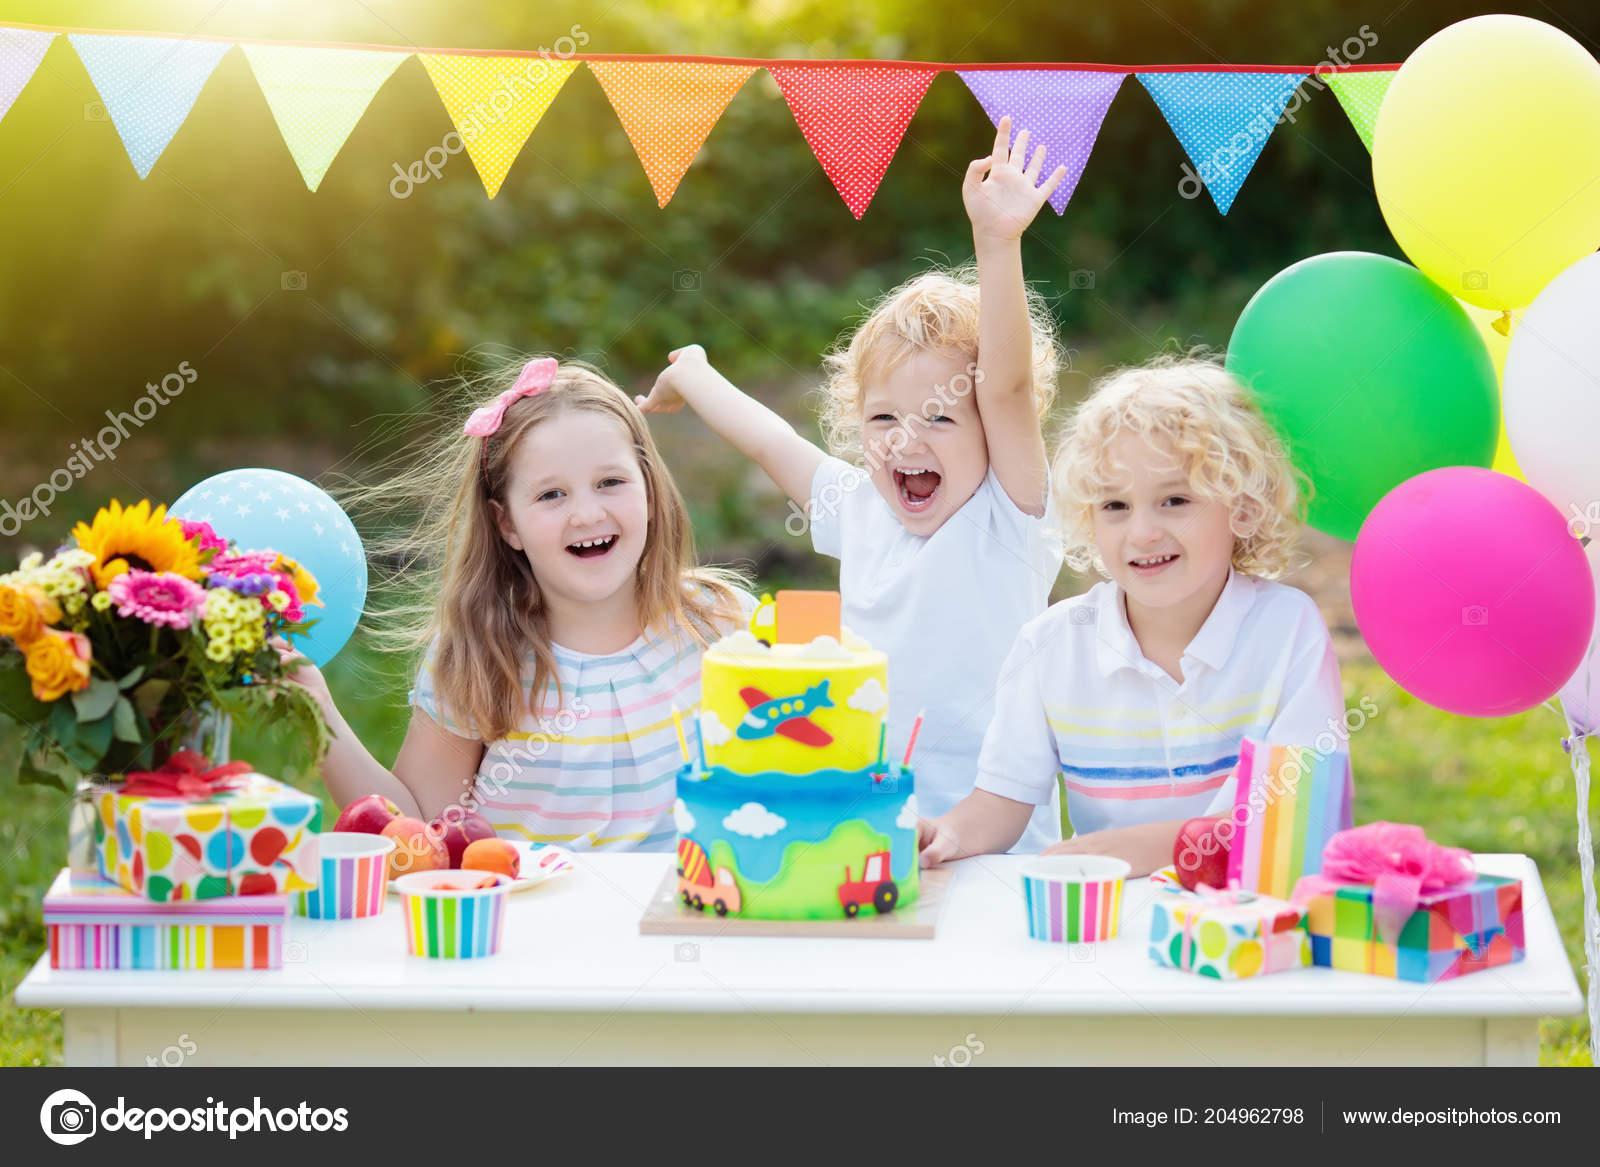 Children Blow Candles Birthday Cake Kids Party Decoration Food Boy